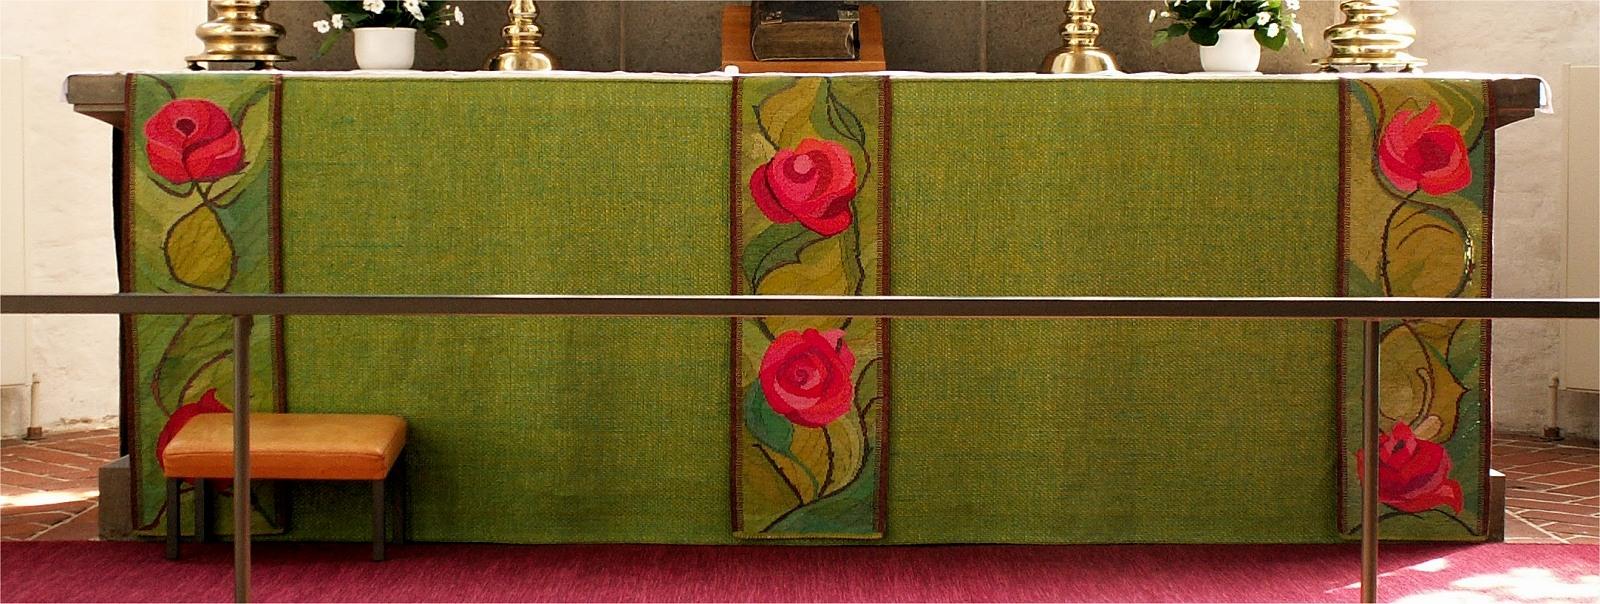 Grøn alterbordforside